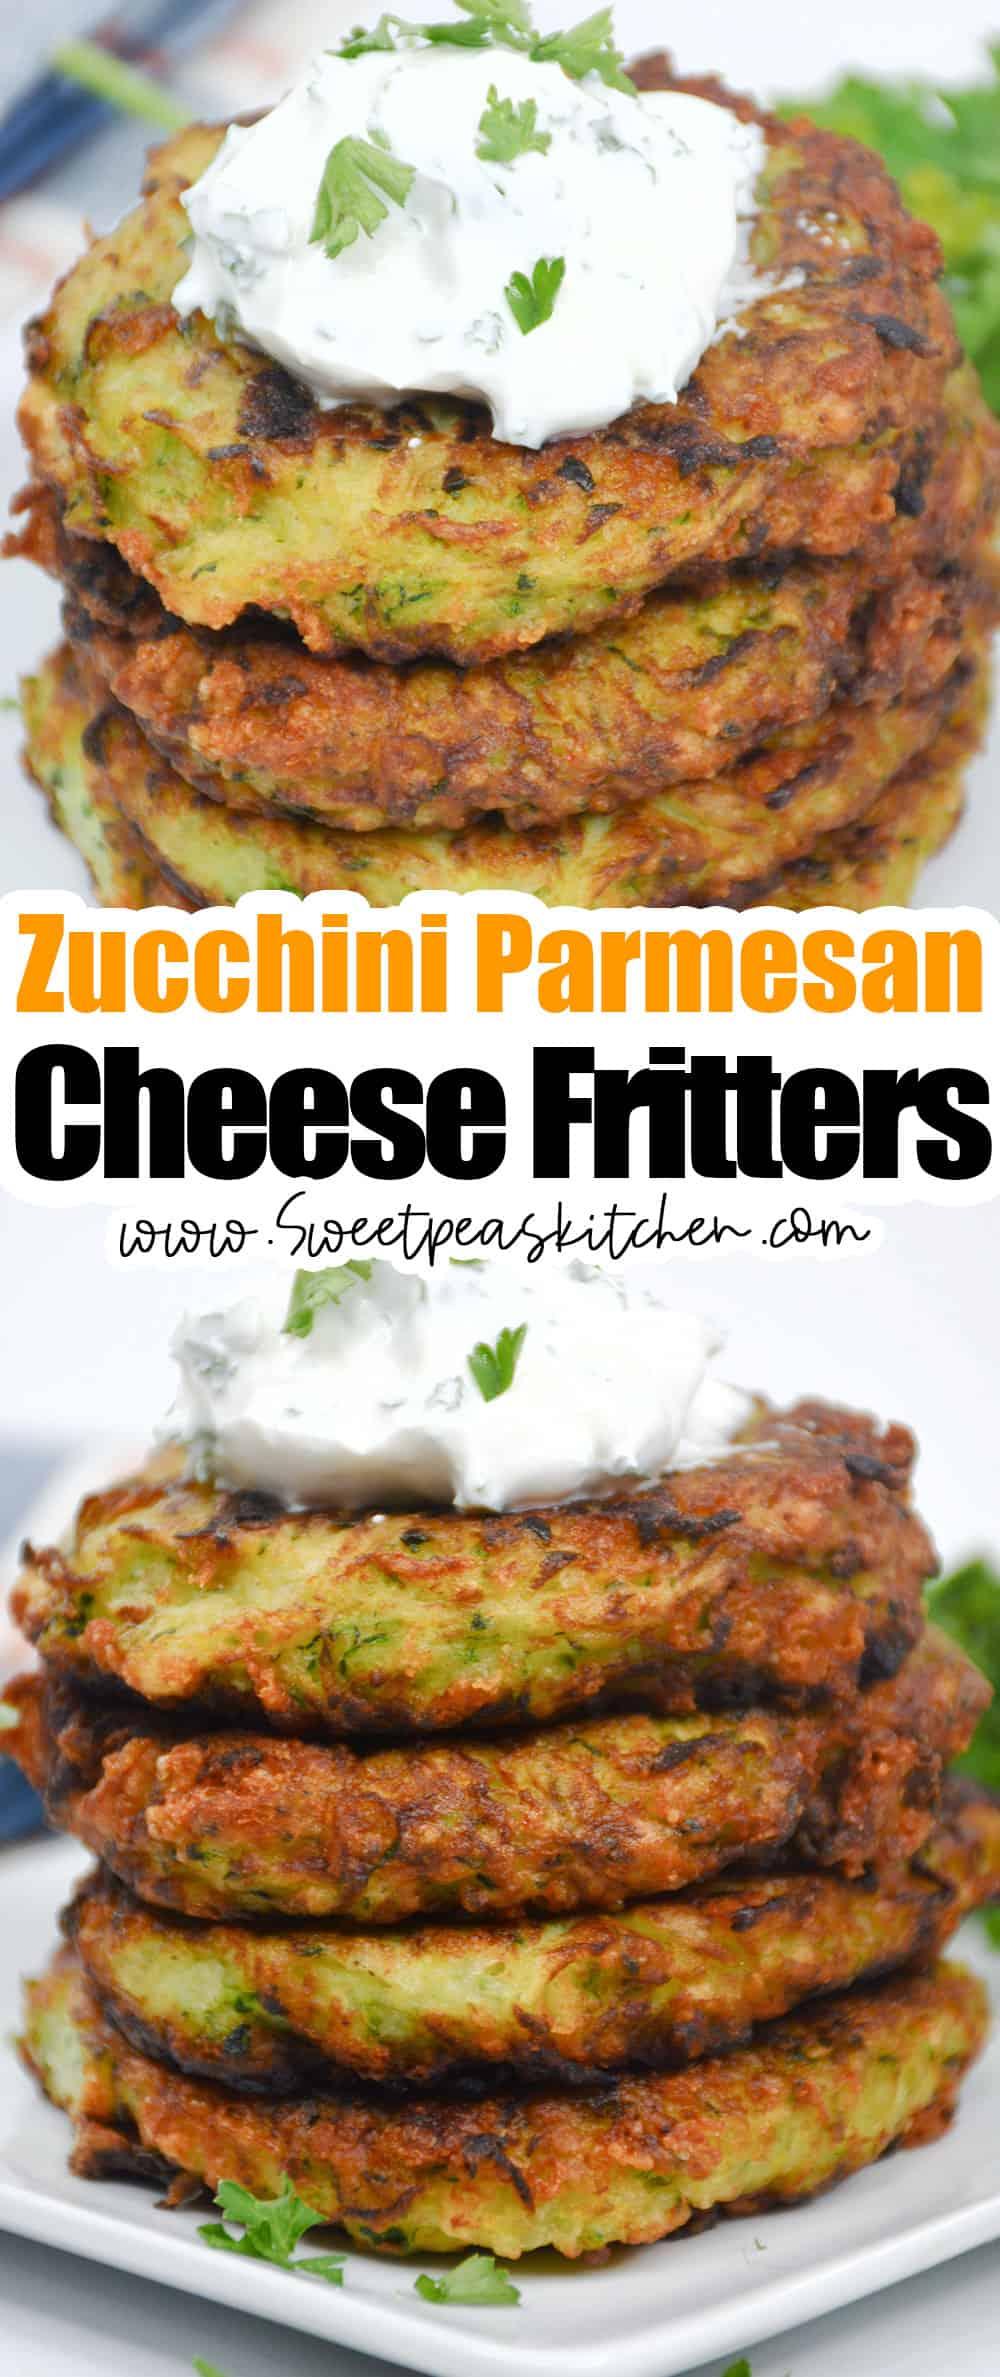 Zucchini Parmesan Cheese Fritters